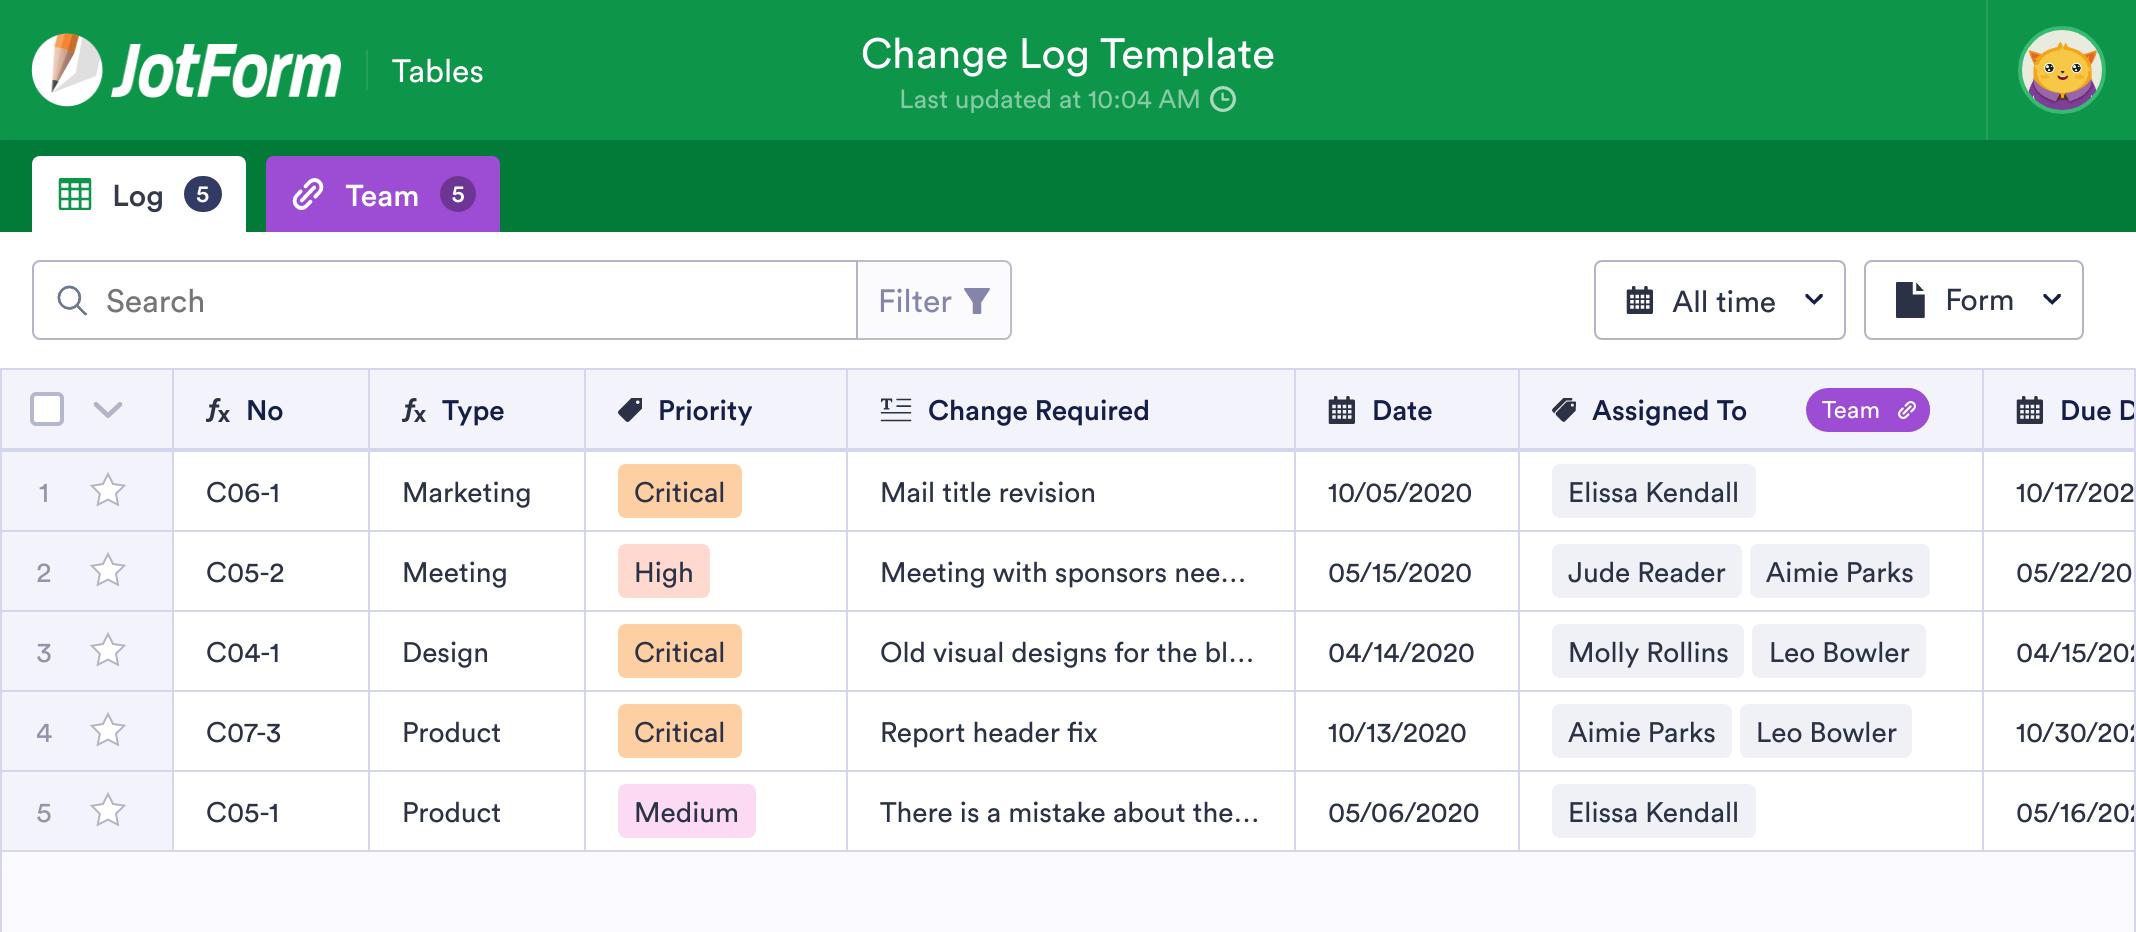 Change Log Template